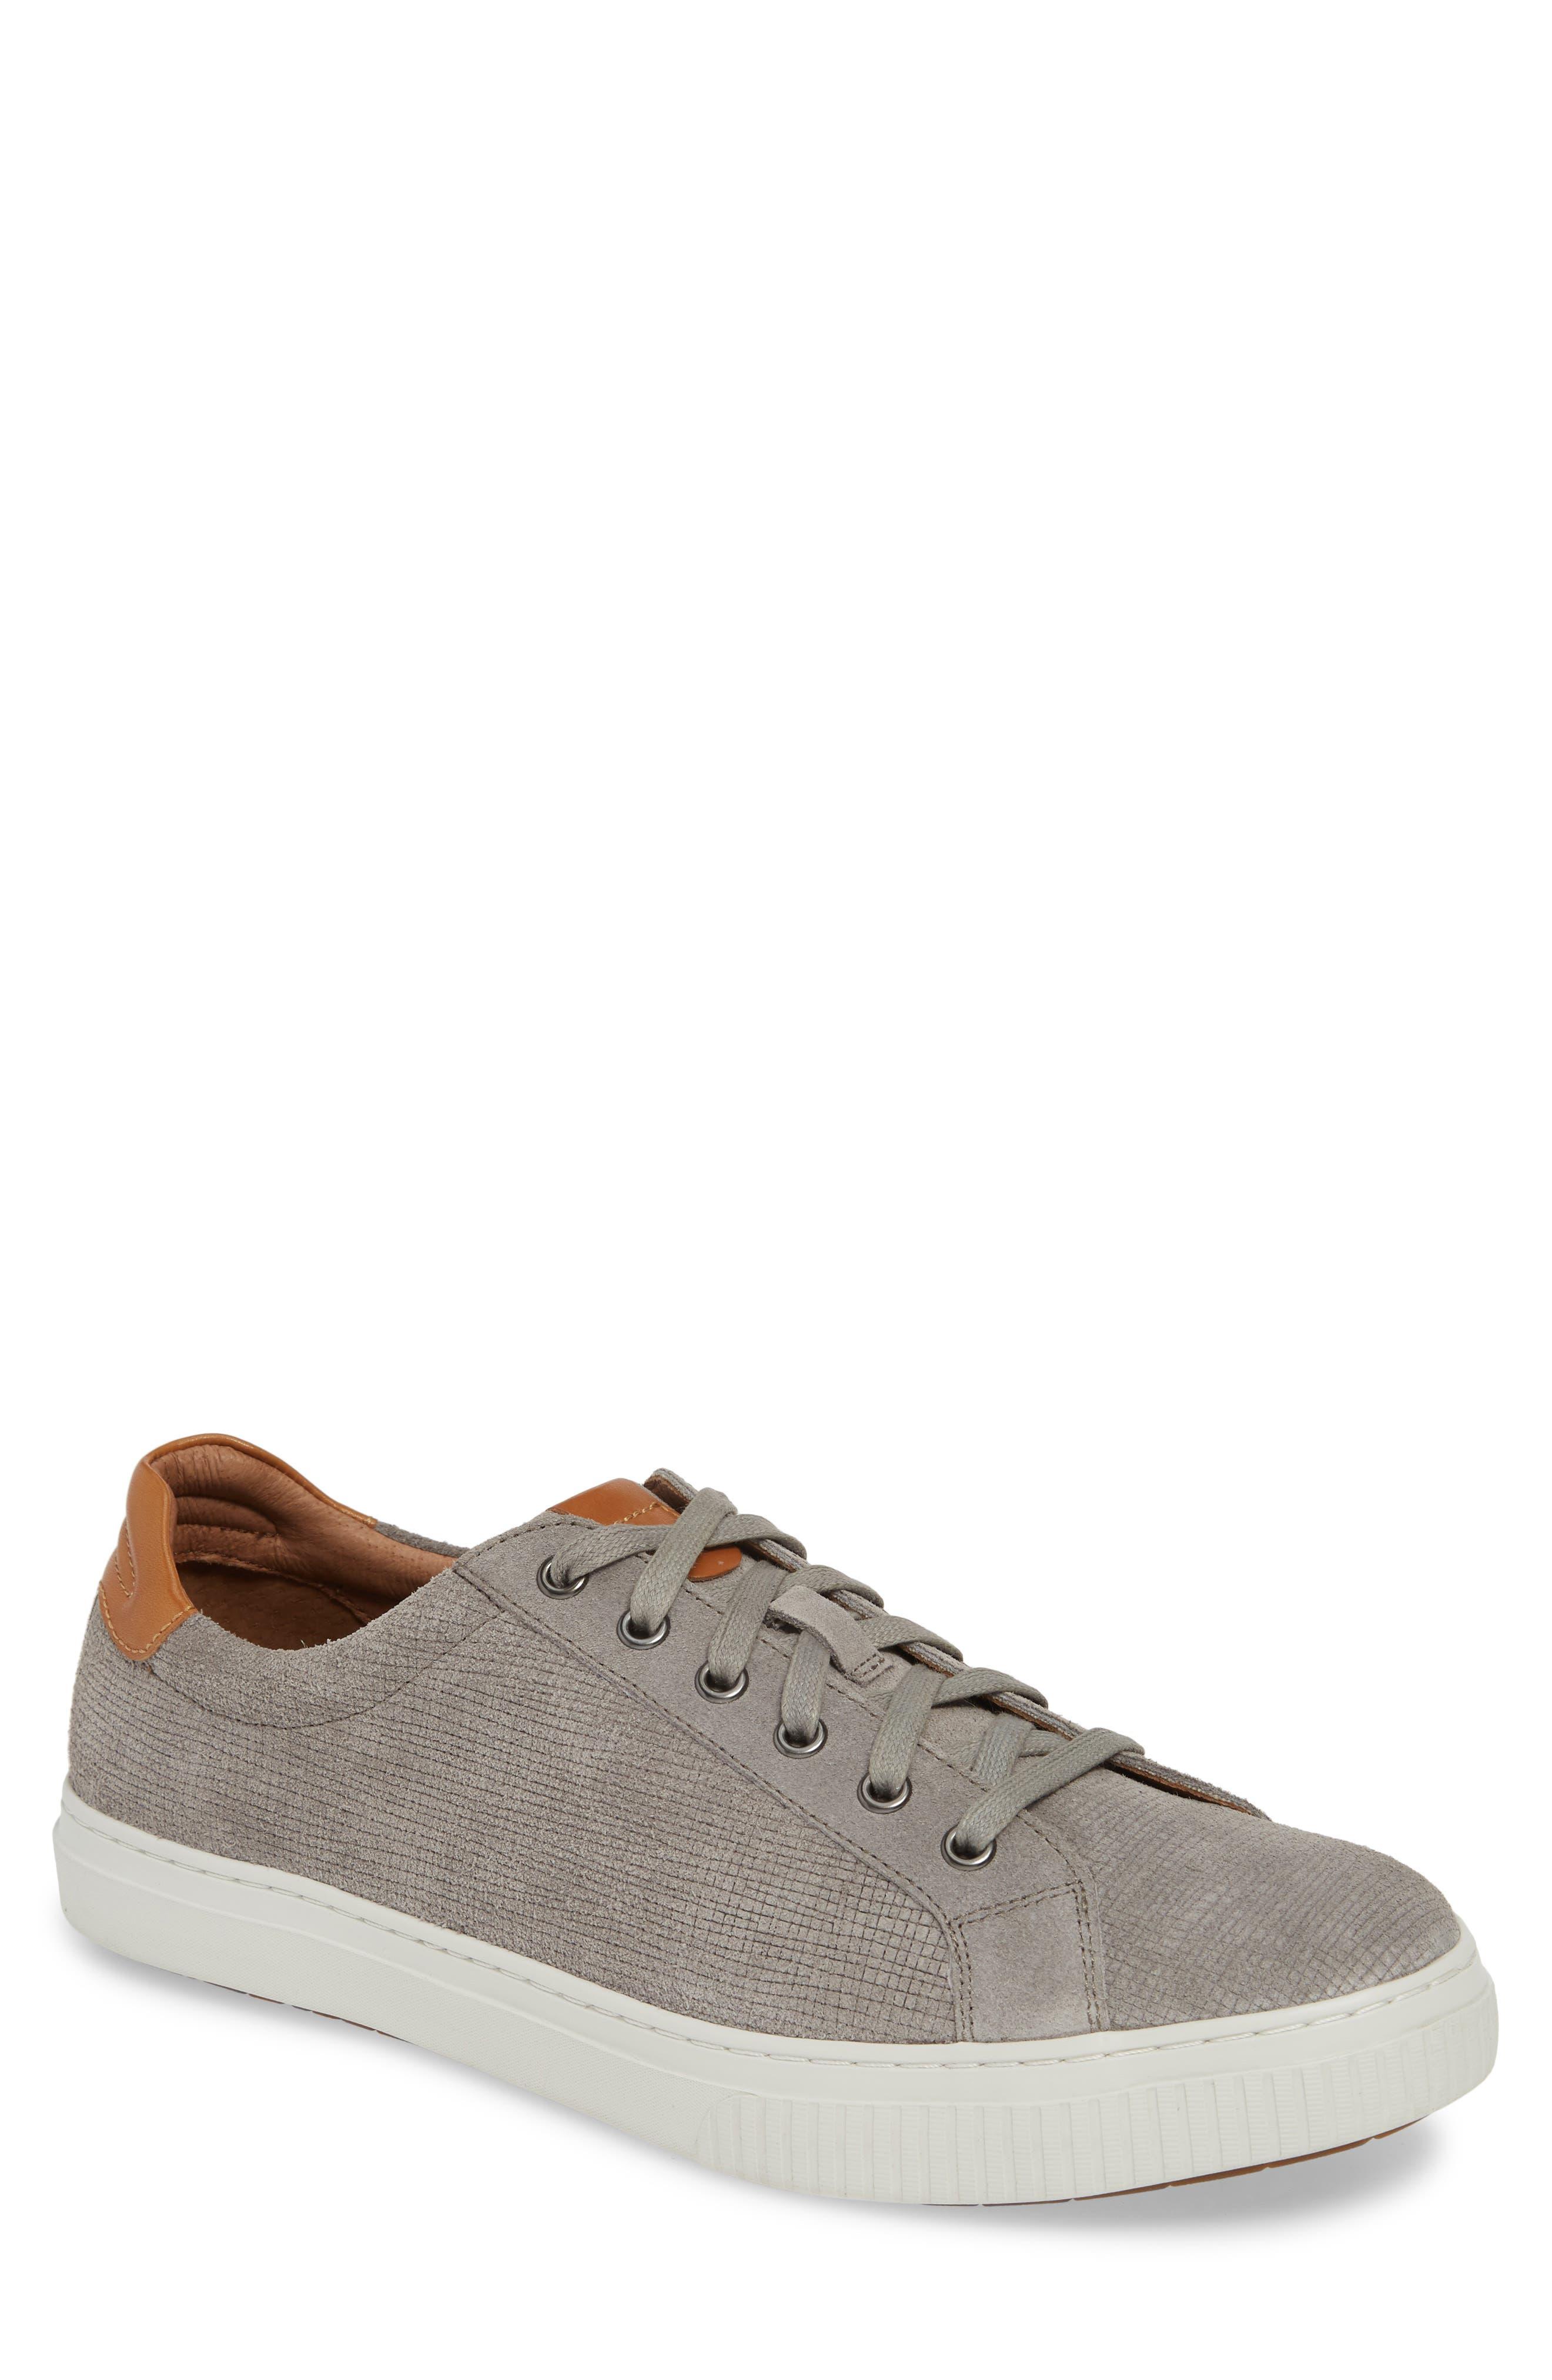 J&M 1850, Toliver Low Top Sneaker, Main thumbnail 1, color, GREY SUEDE